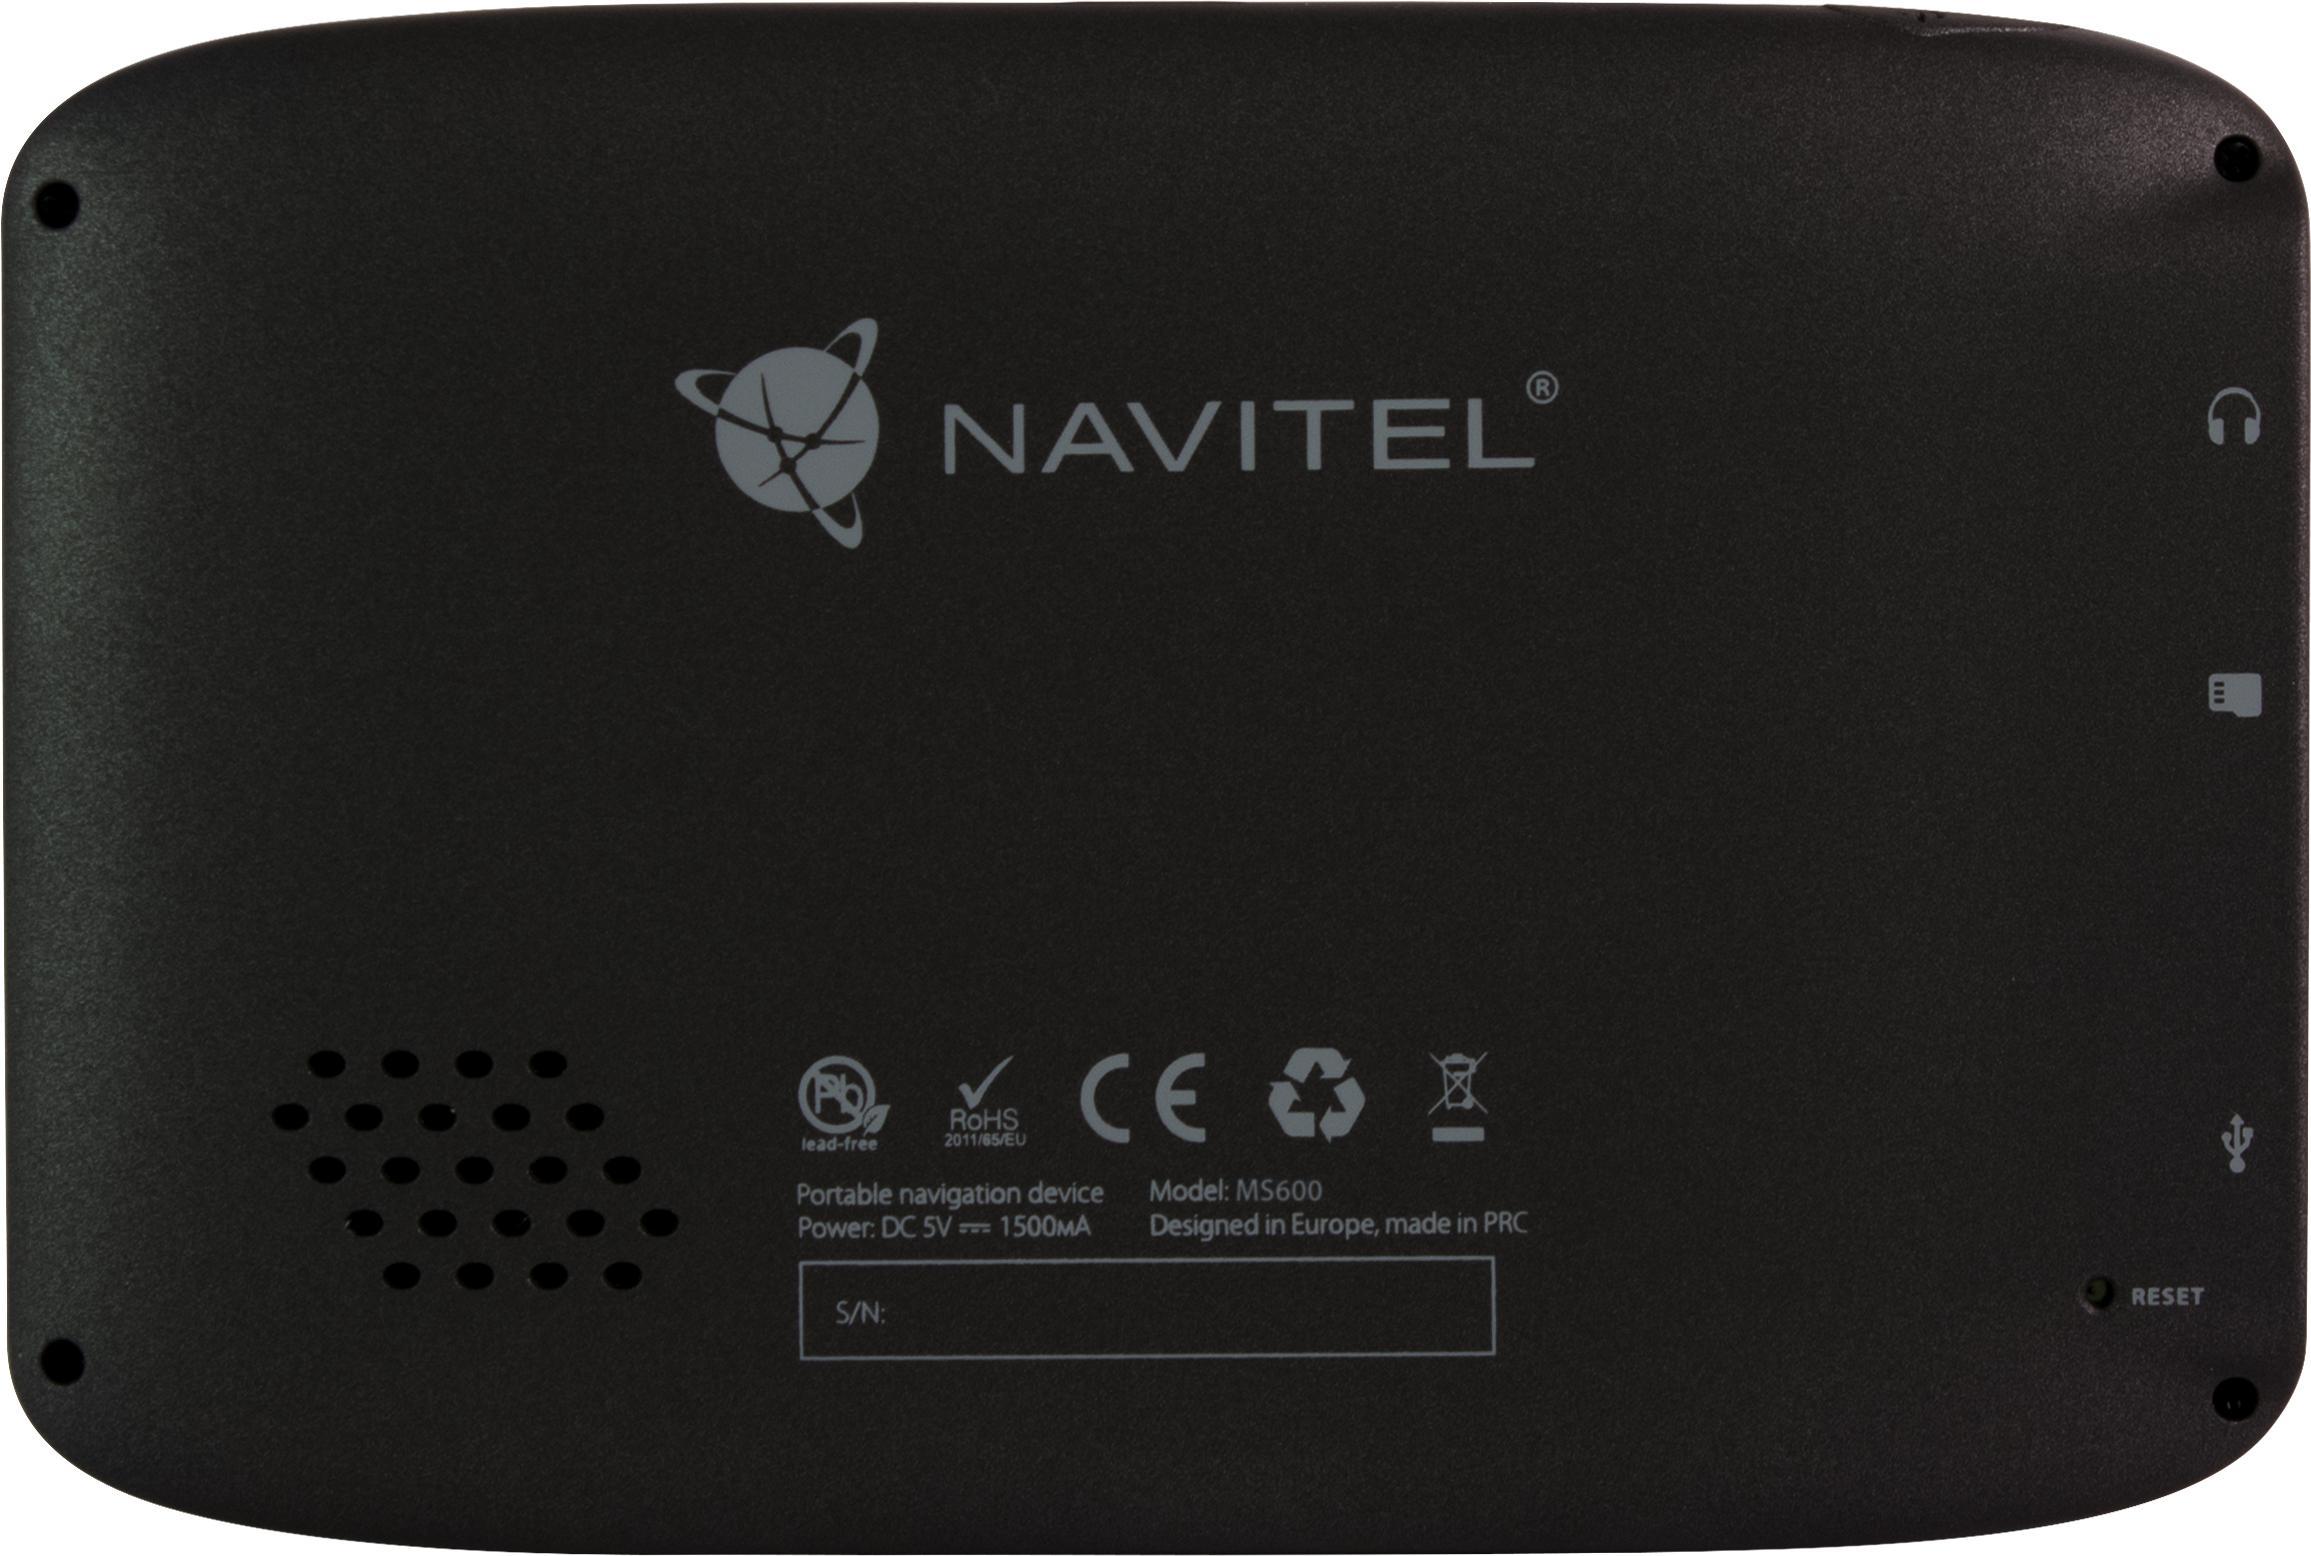 NAVMS400 Navigationssystem NAVITEL Test